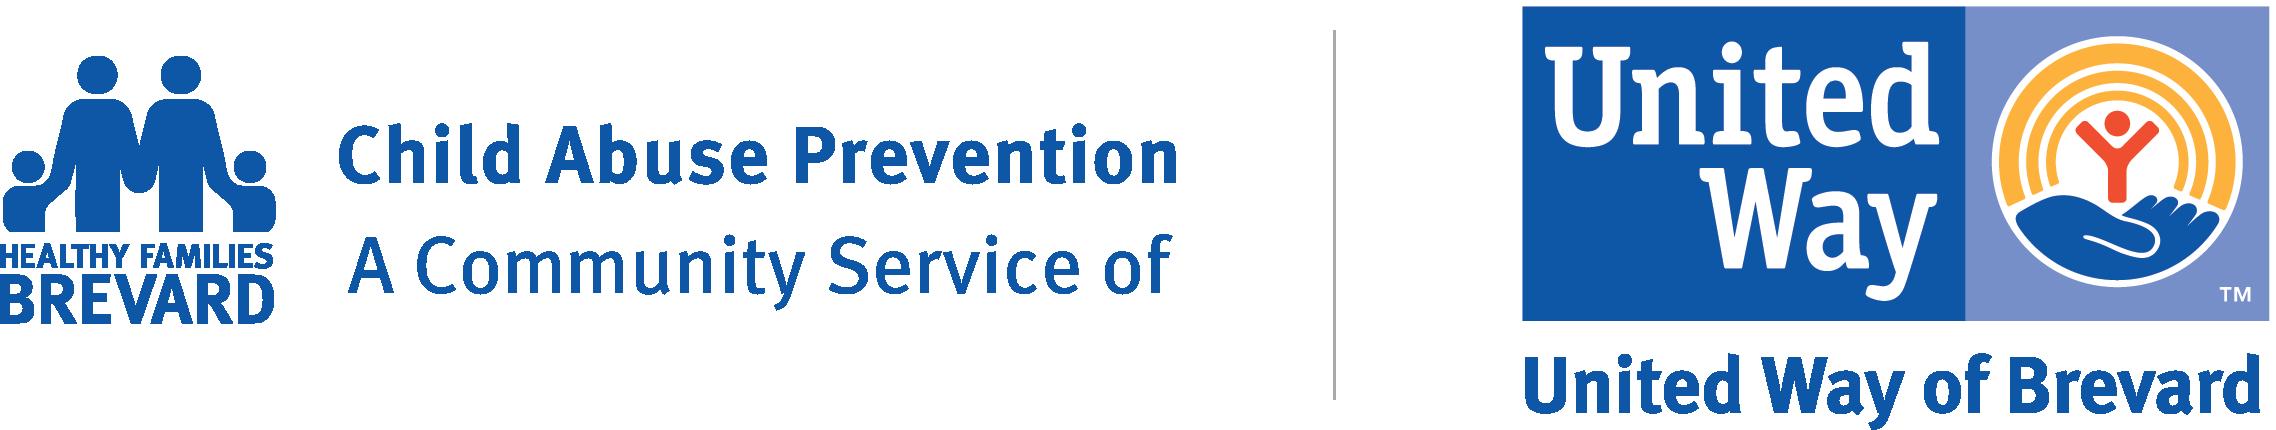 Healthy Families Brevard logo